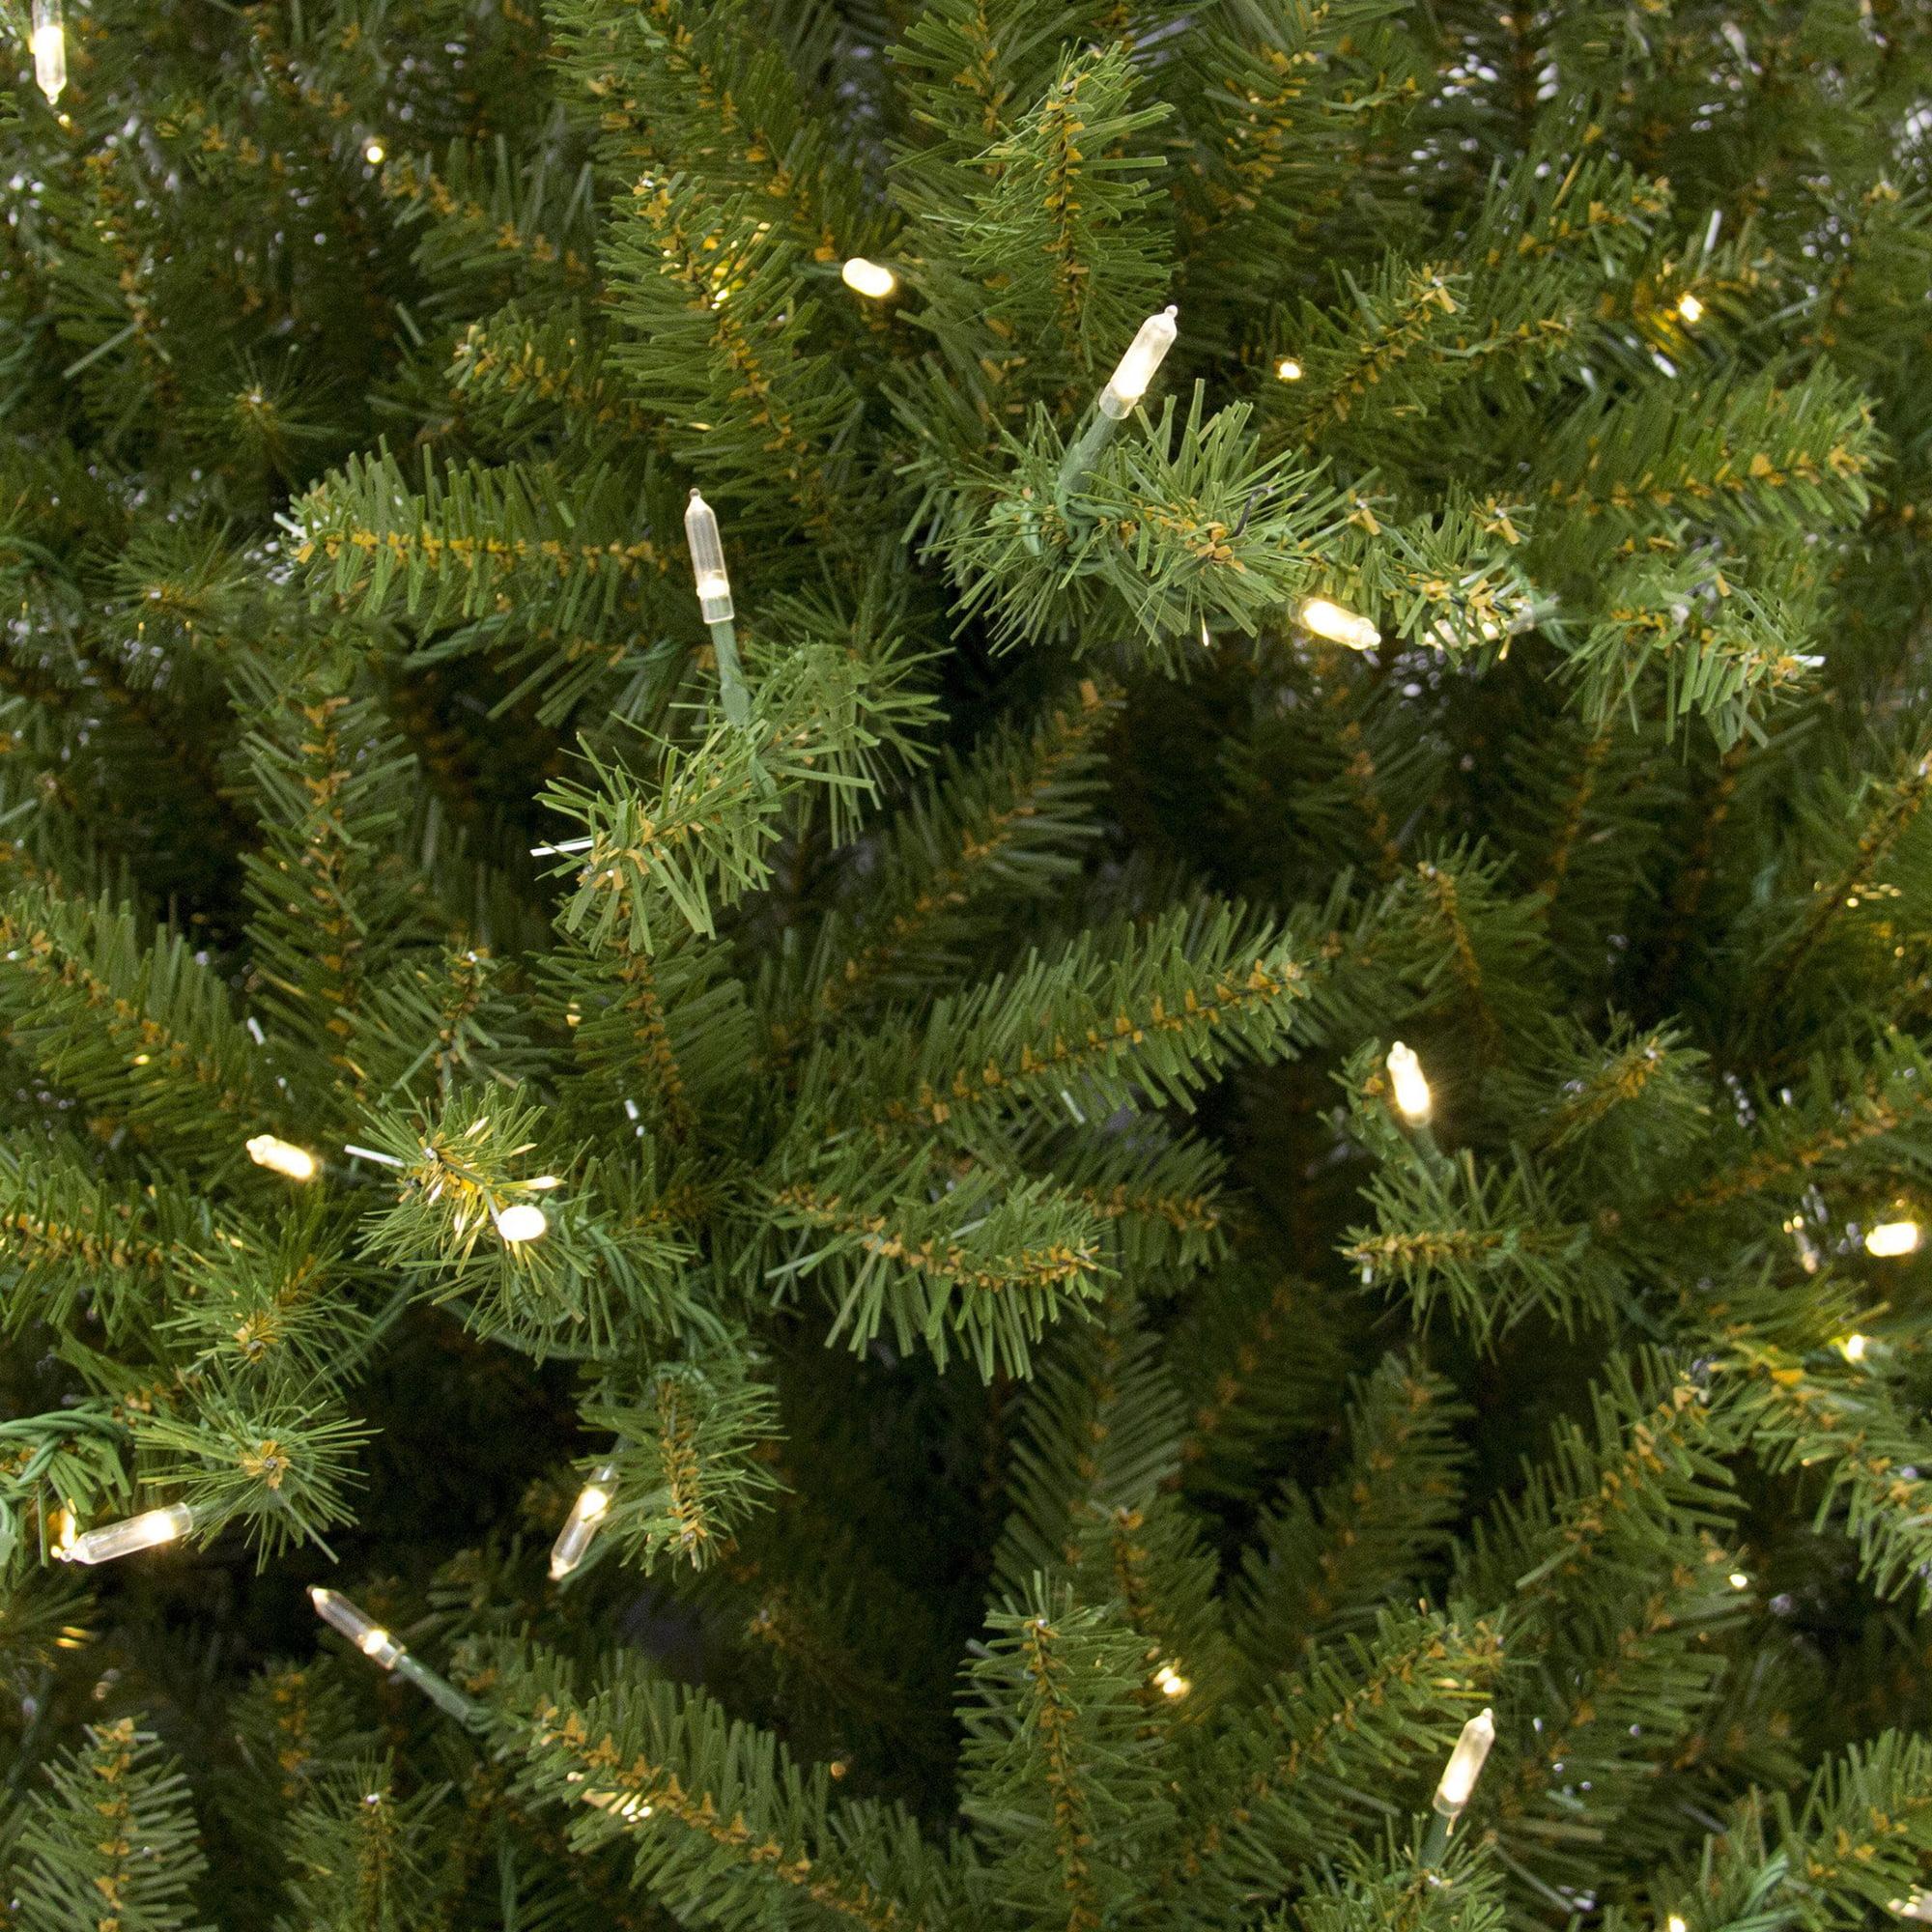 Best Choice Products 7 5ft Pre Lit Hinged Douglas Full Fir Artificial Christmas Tree Holiday Decoration W 700 Lights Walmart Com Walmart Com